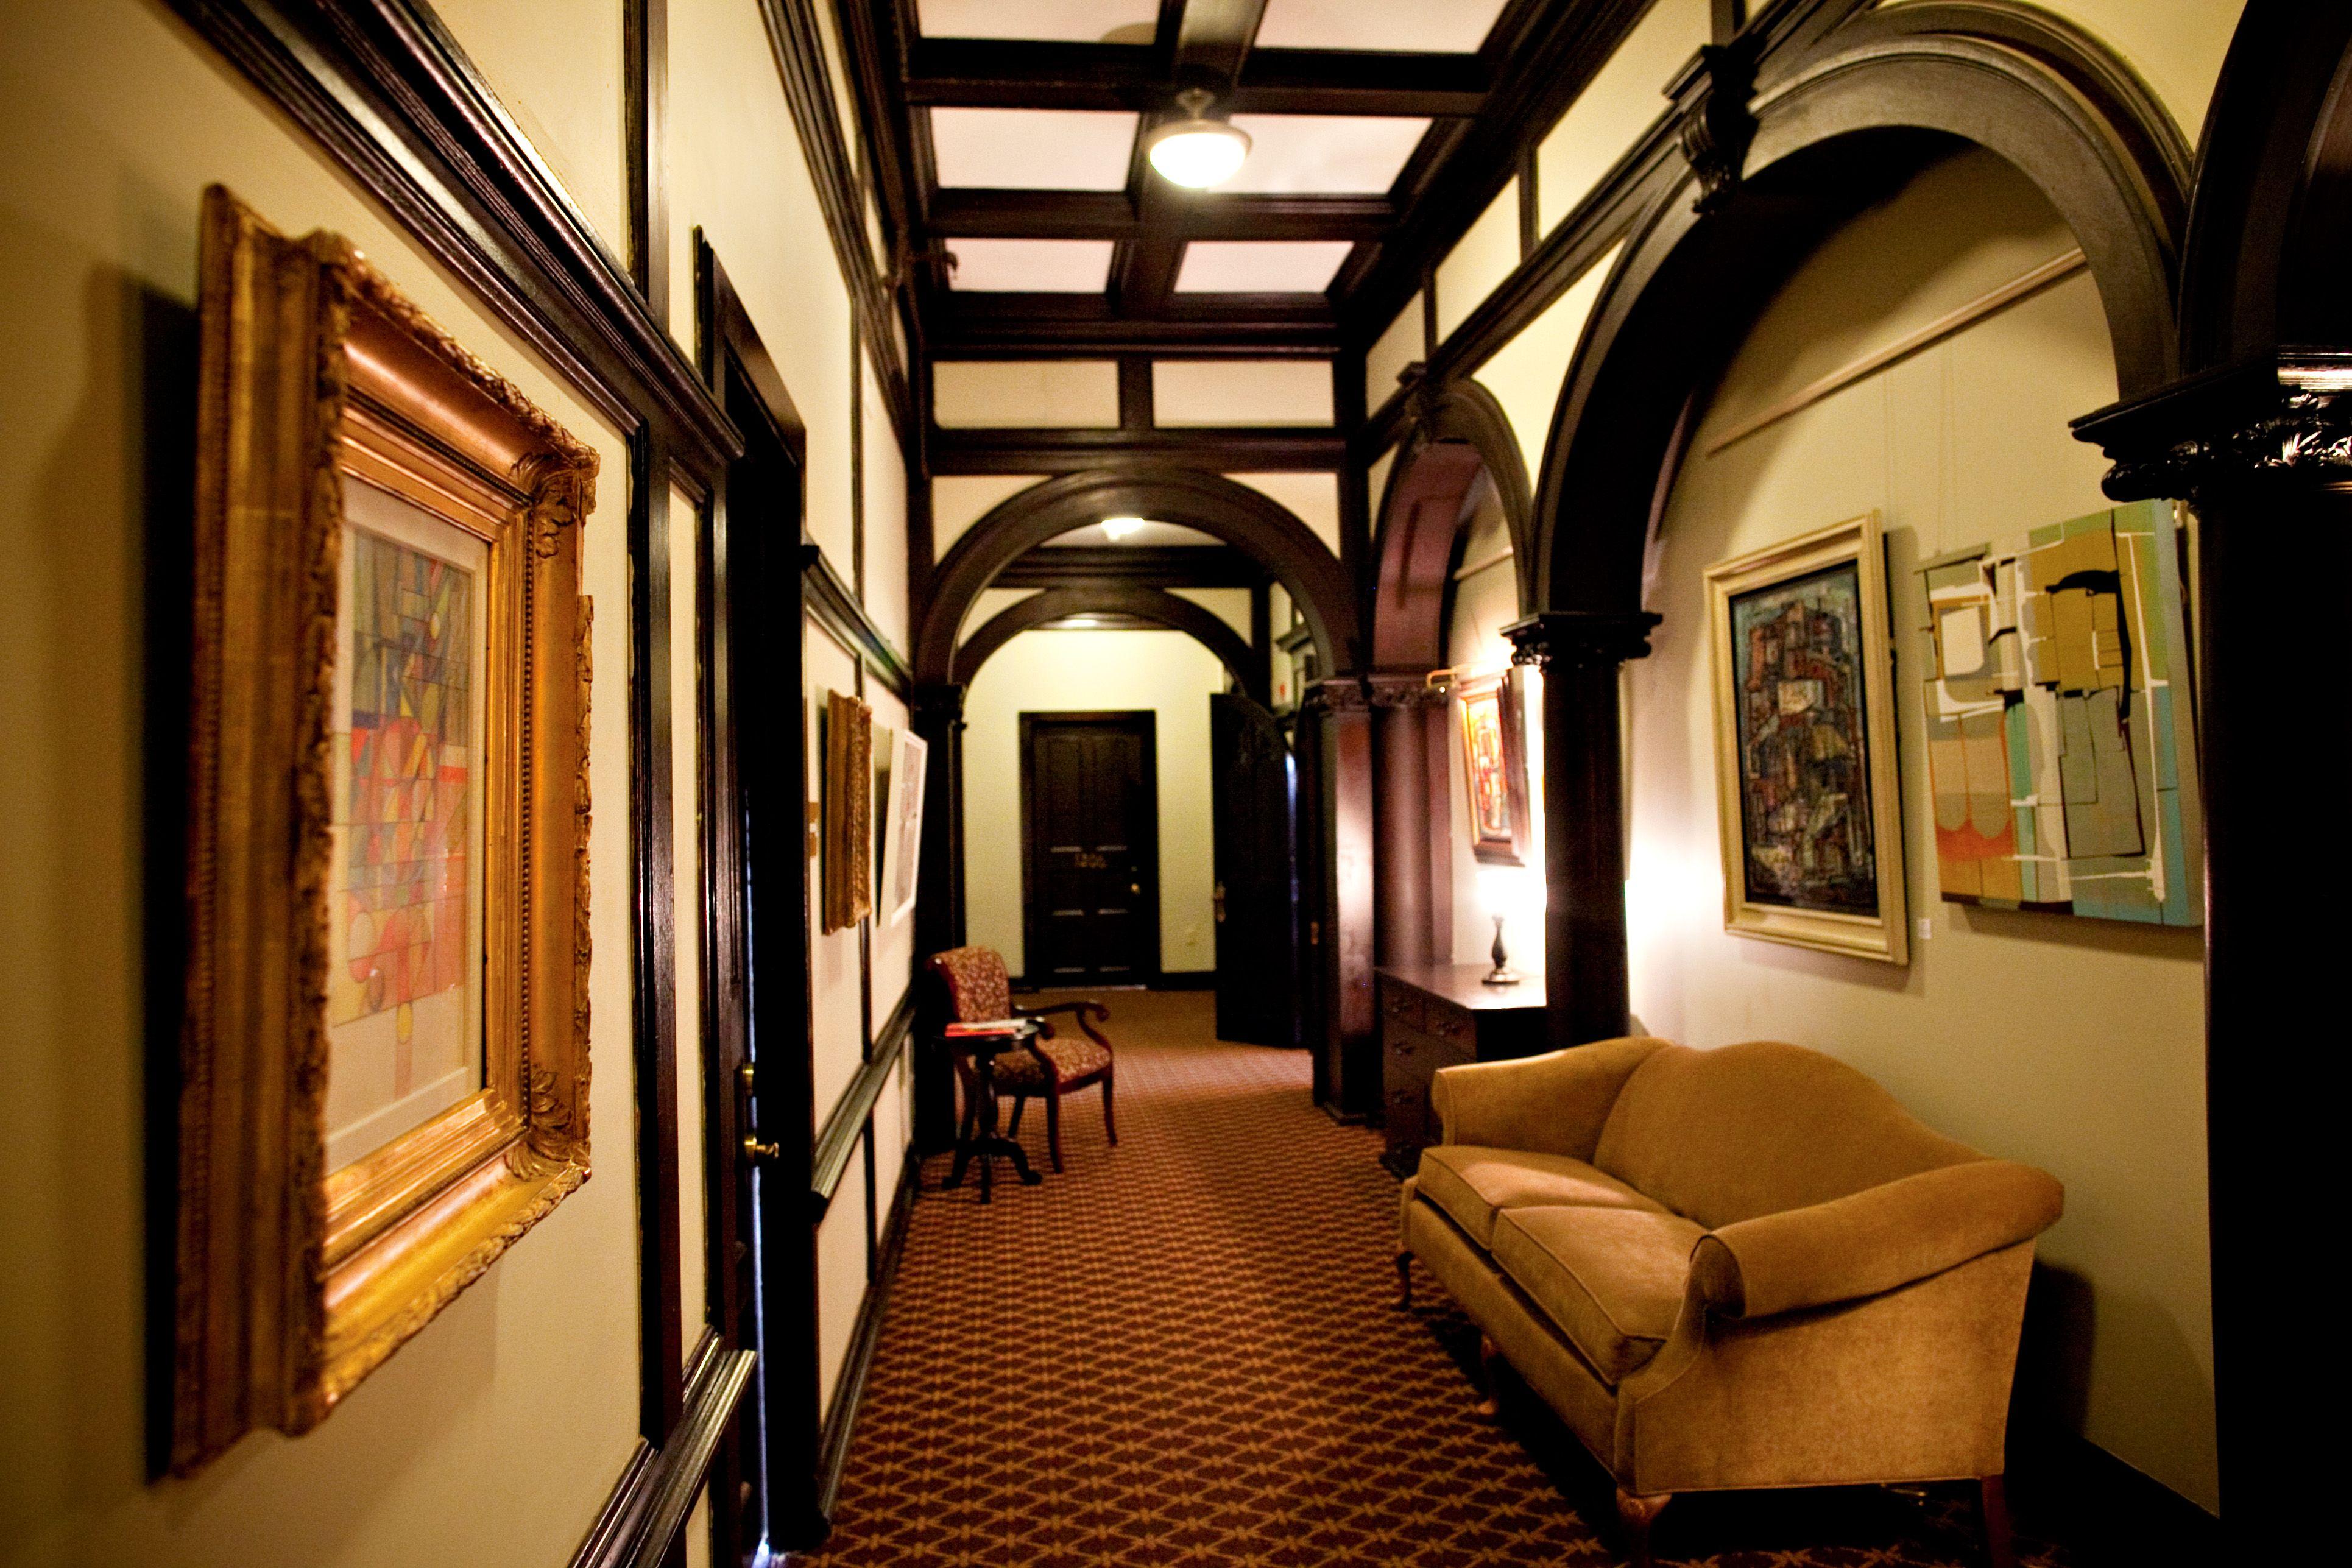 File:Bragg-Mitchell Mansion Hallway.JPG - Wikimedia Commons